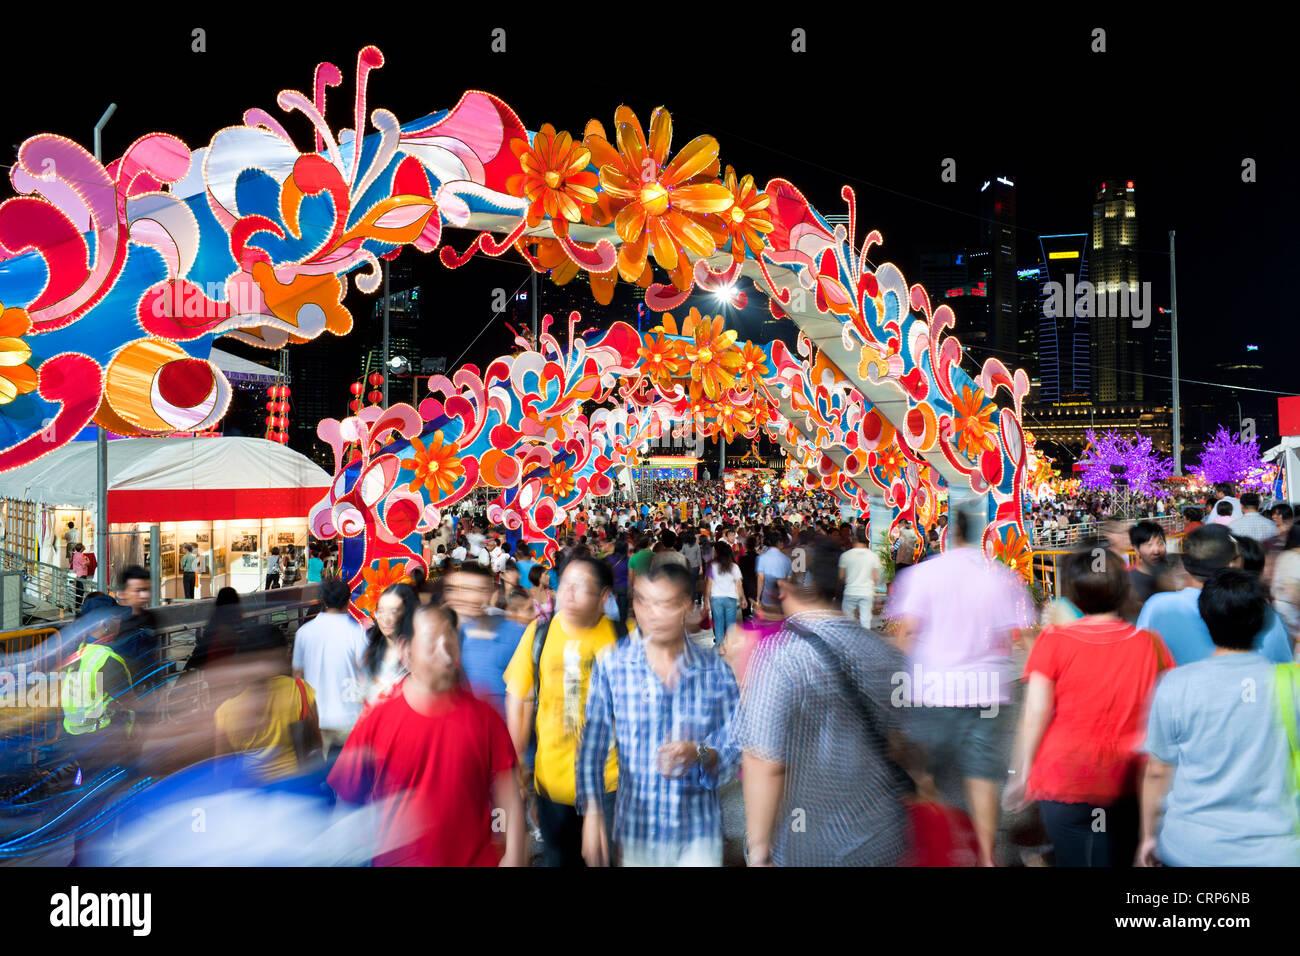 River Hongbao decorations for Chinese New Year celebrations at Marina Bay, Singapore - Stock Image